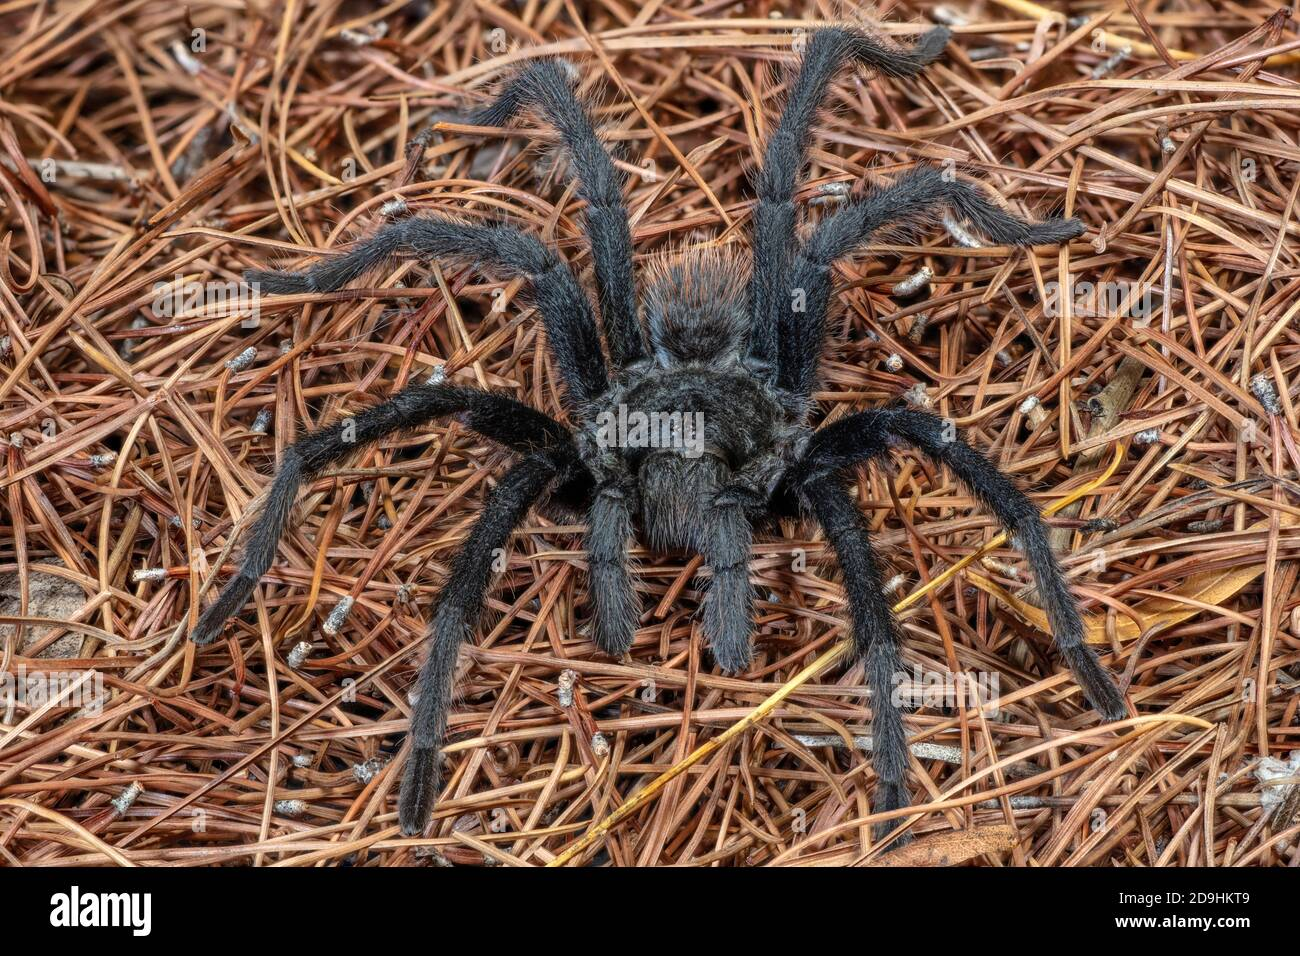 Desert Tarantula High Resolution Stock Photography And Images Alamy